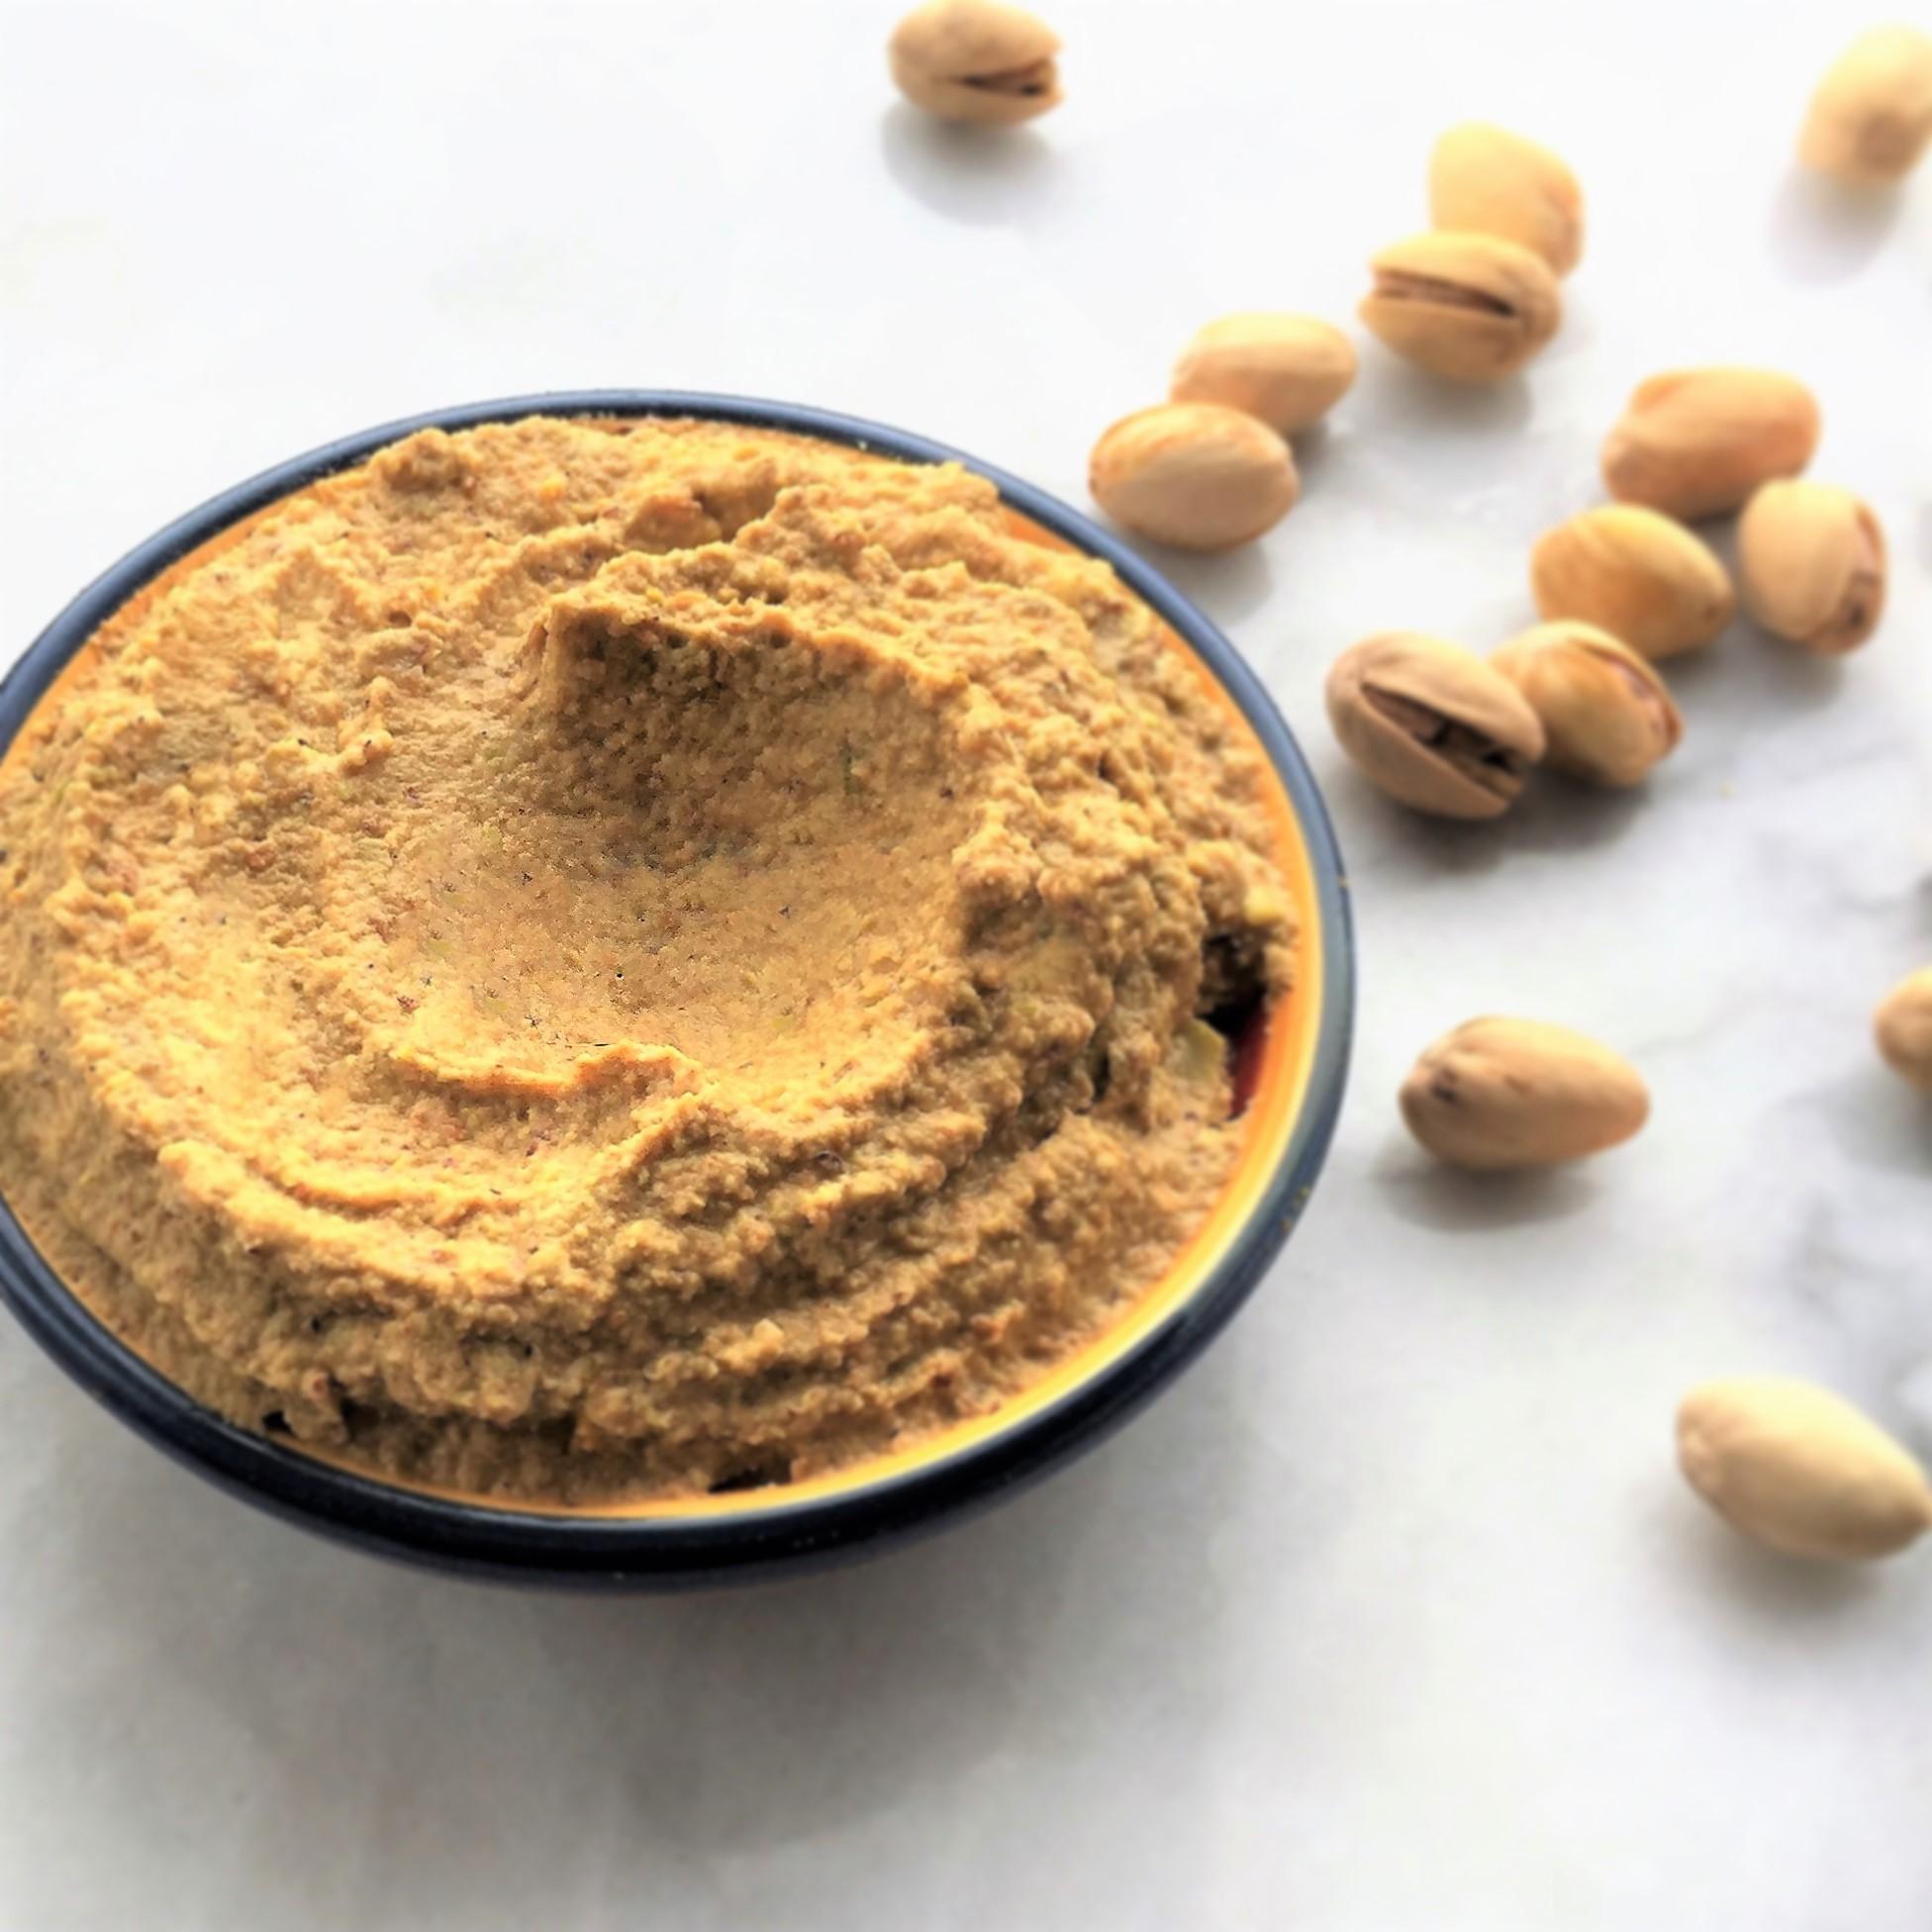 poached pistachio puree